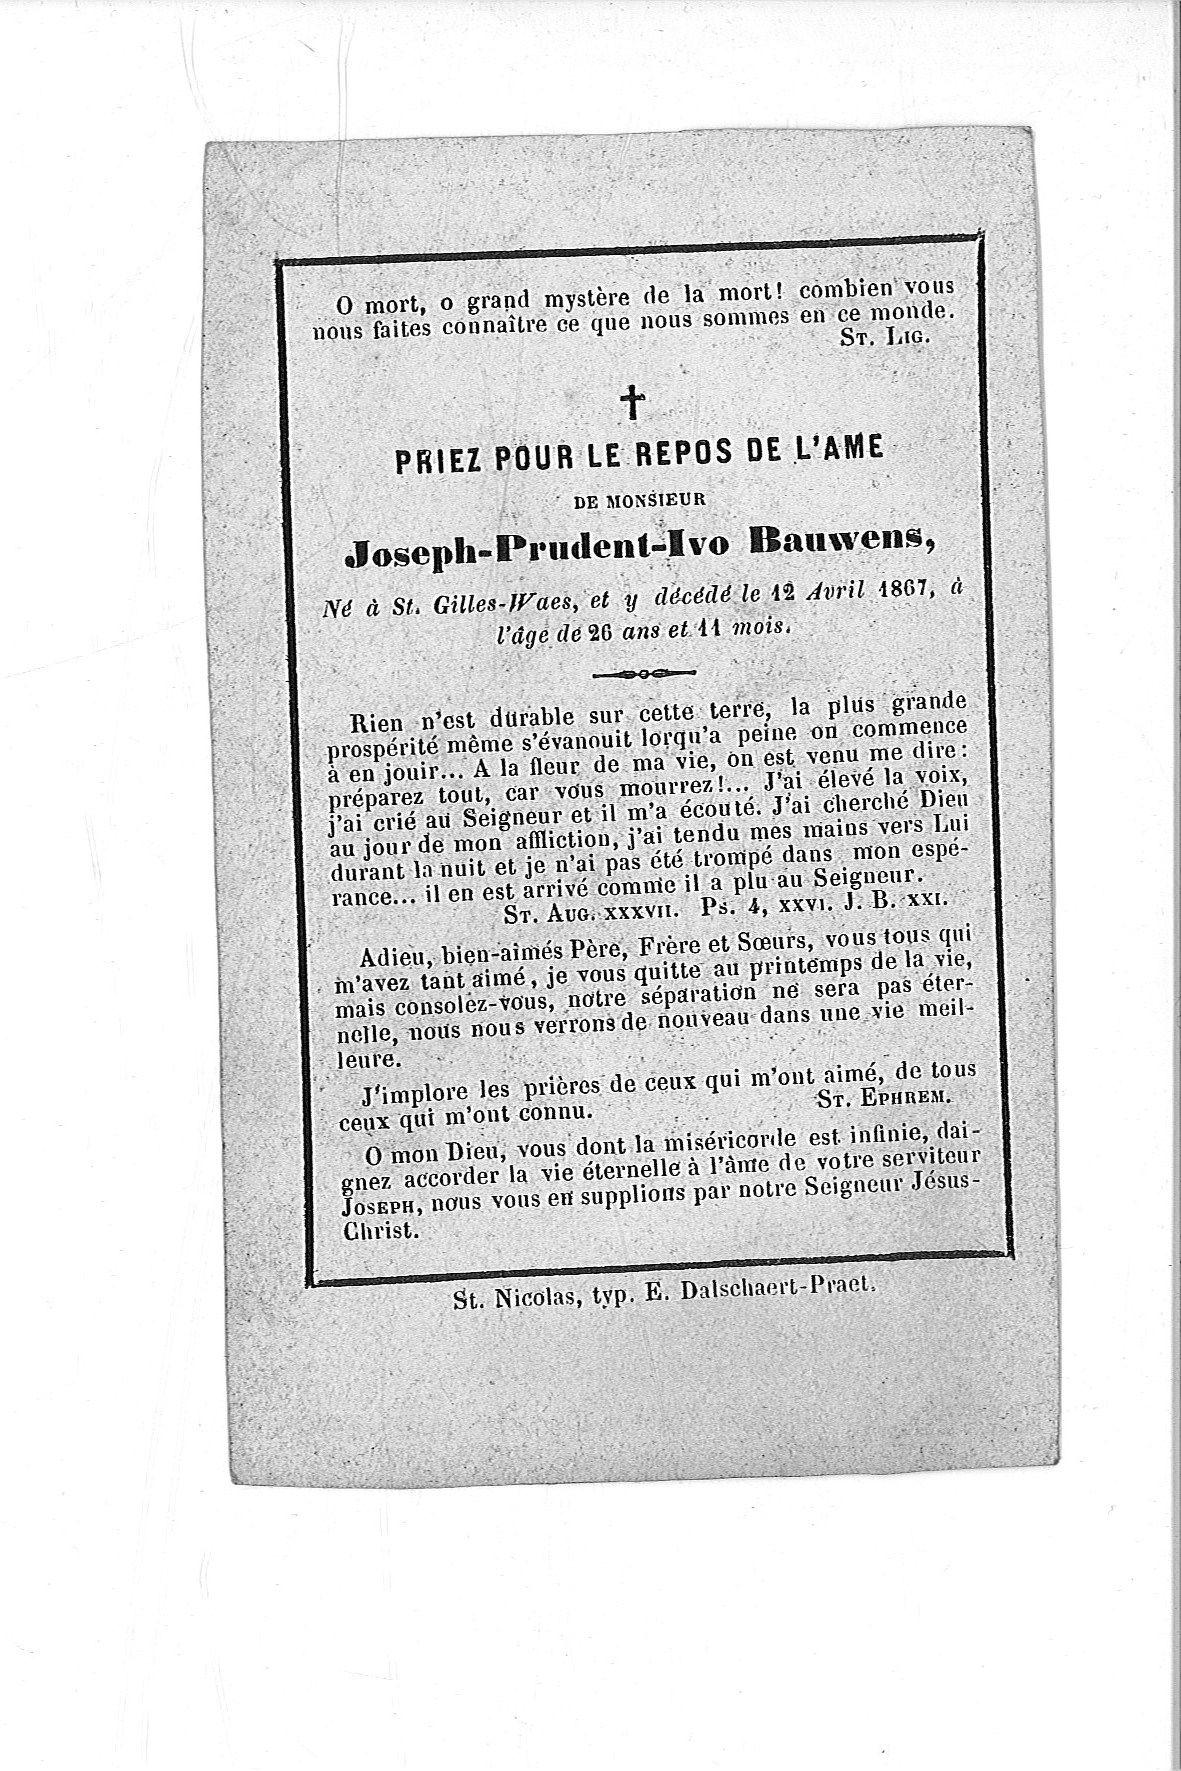 Joseph-Prudent-Ivo(1867)20090806114958_00023.jpg